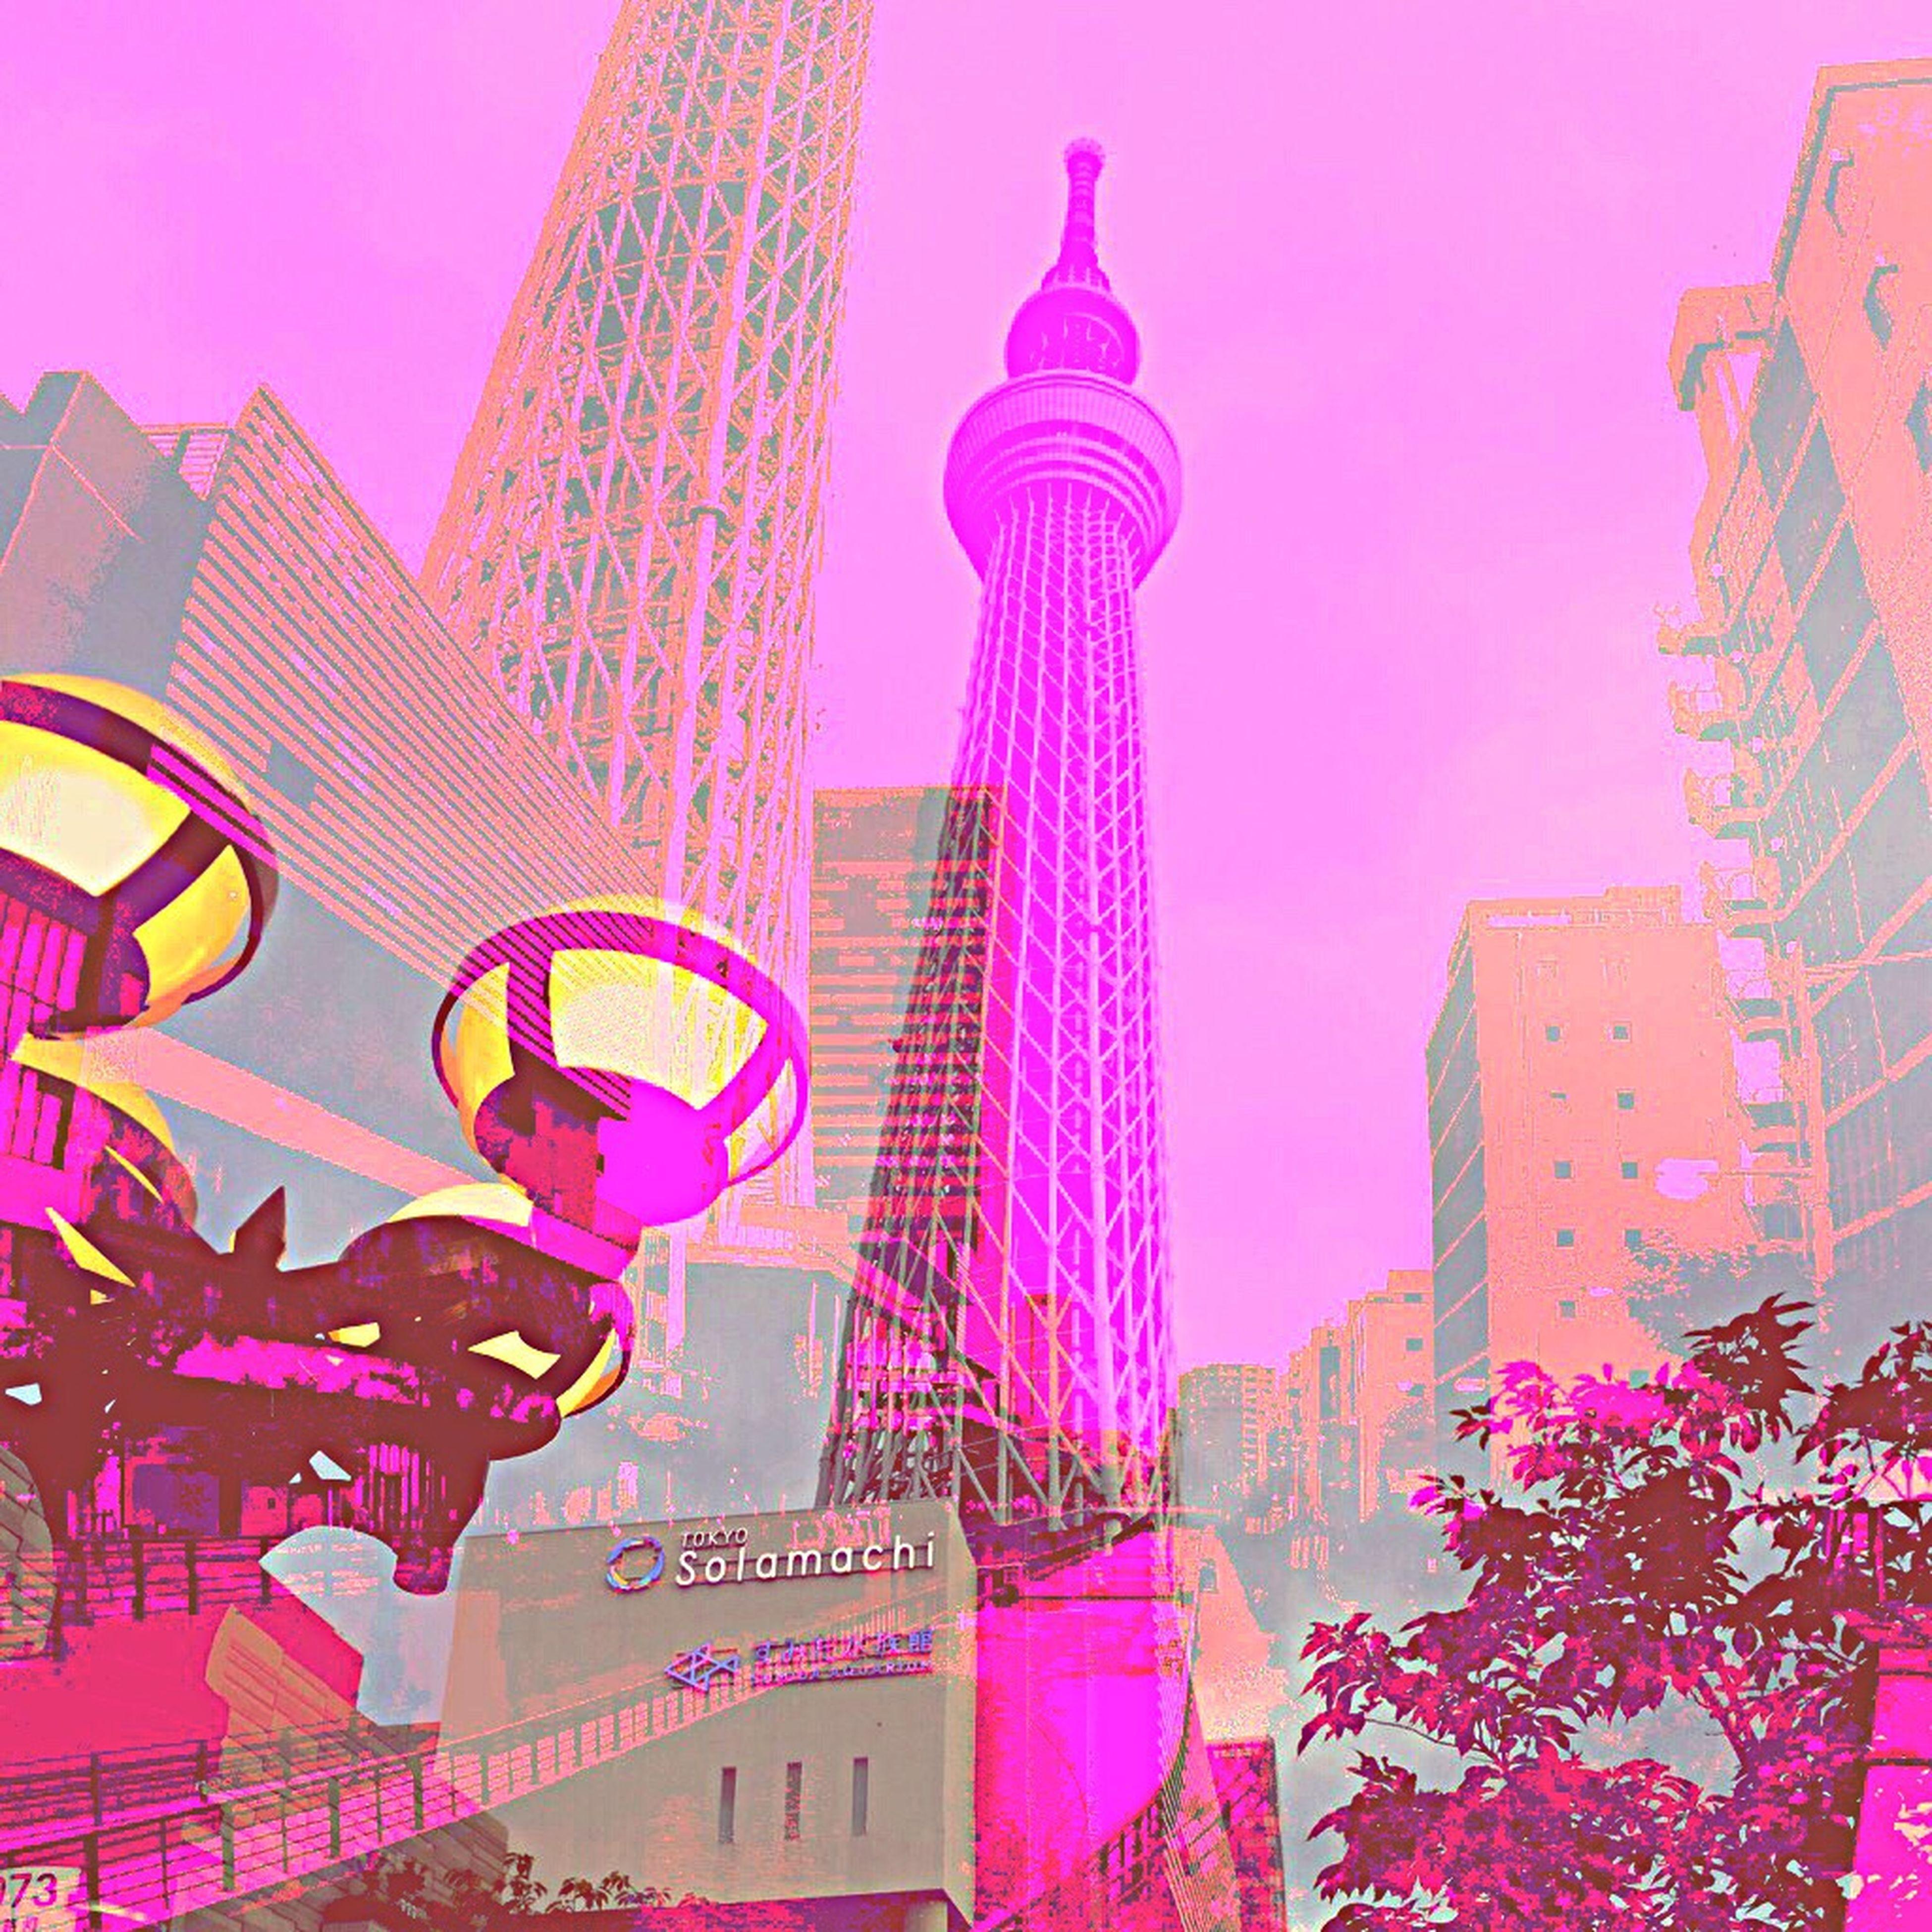 architecture, built structure, building exterior, low angle view, tall - high, tower, famous place, city, international landmark, capital cities, travel destinations, communication, sky, tourism, arts culture and entertainment, amusement park ride, clear sky, modern, travel, amusement park